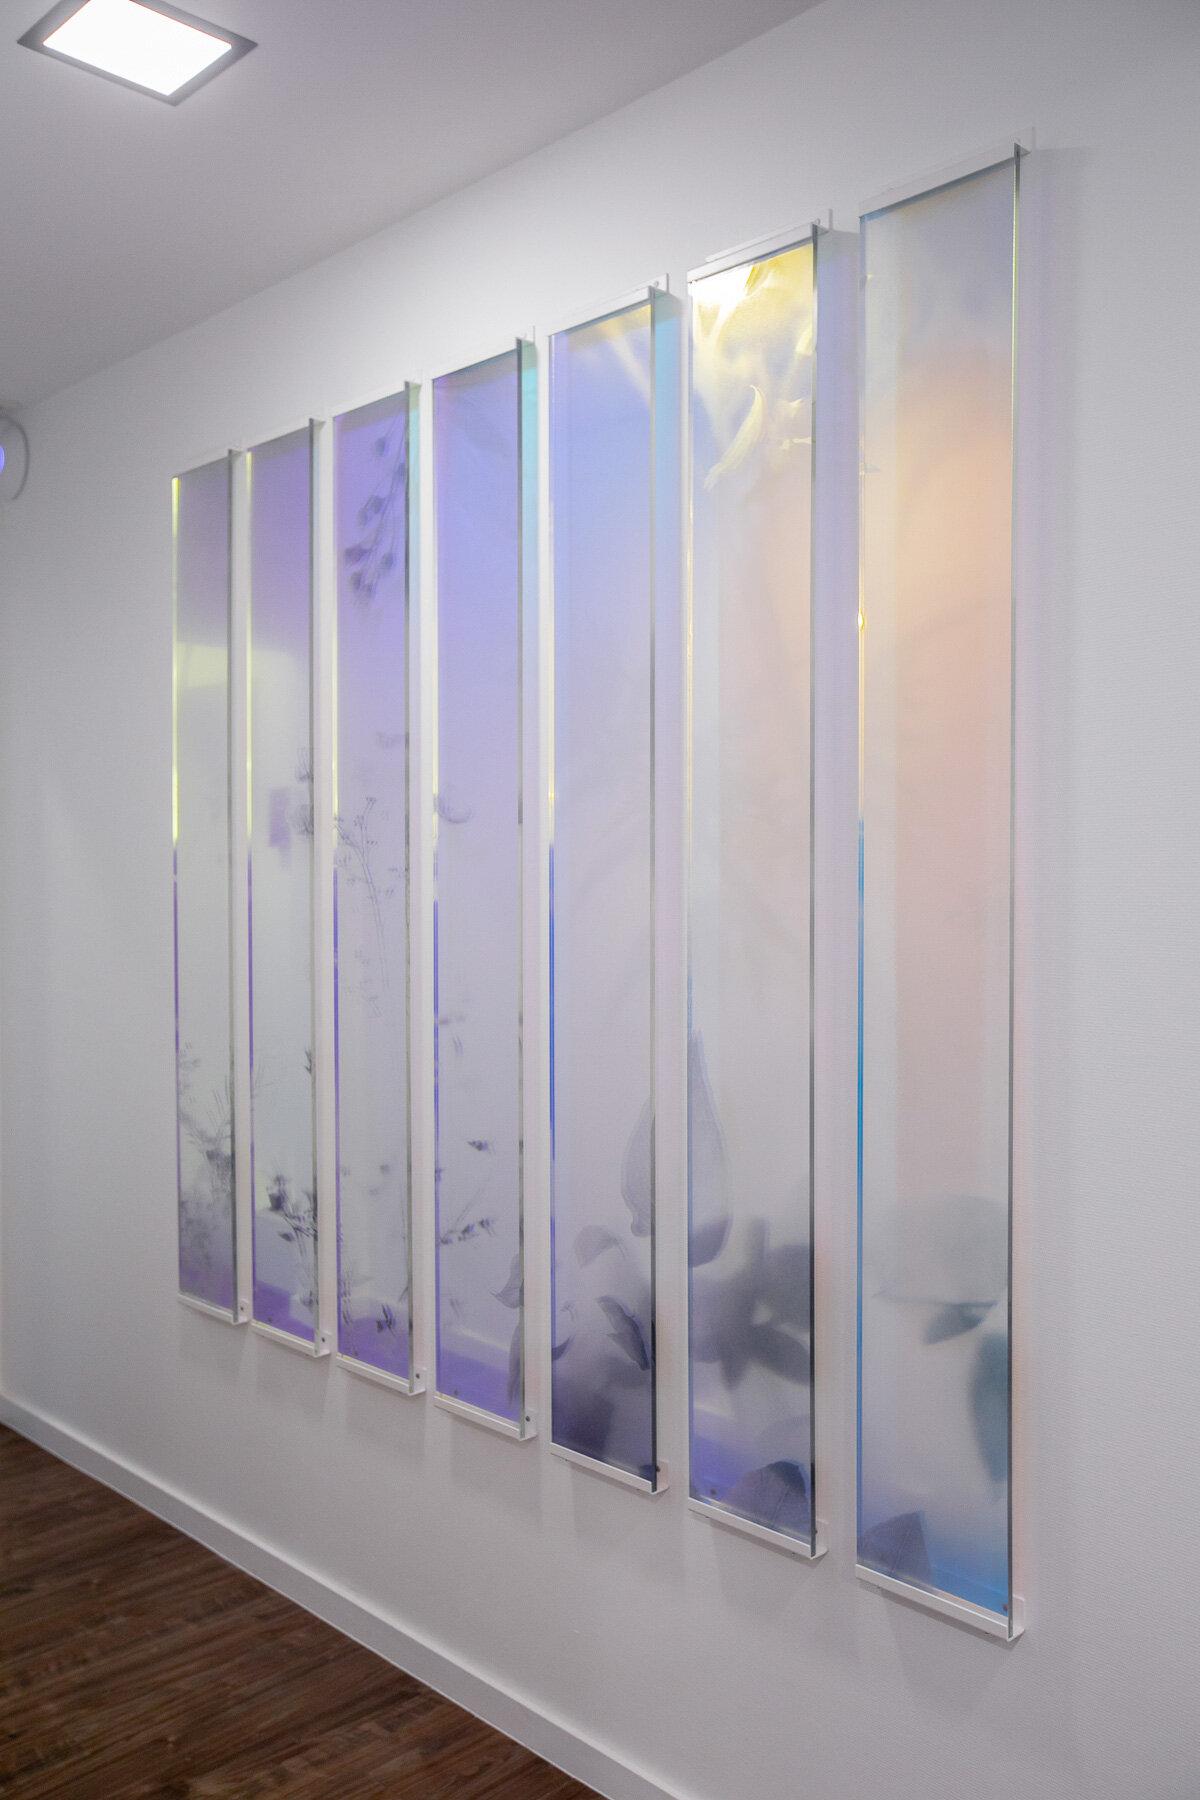 Zahnarzt-Praxis-Doerthe-Fischer-Wuerzburg-kunst-installation-michael-acapulco-1150-2.jpg